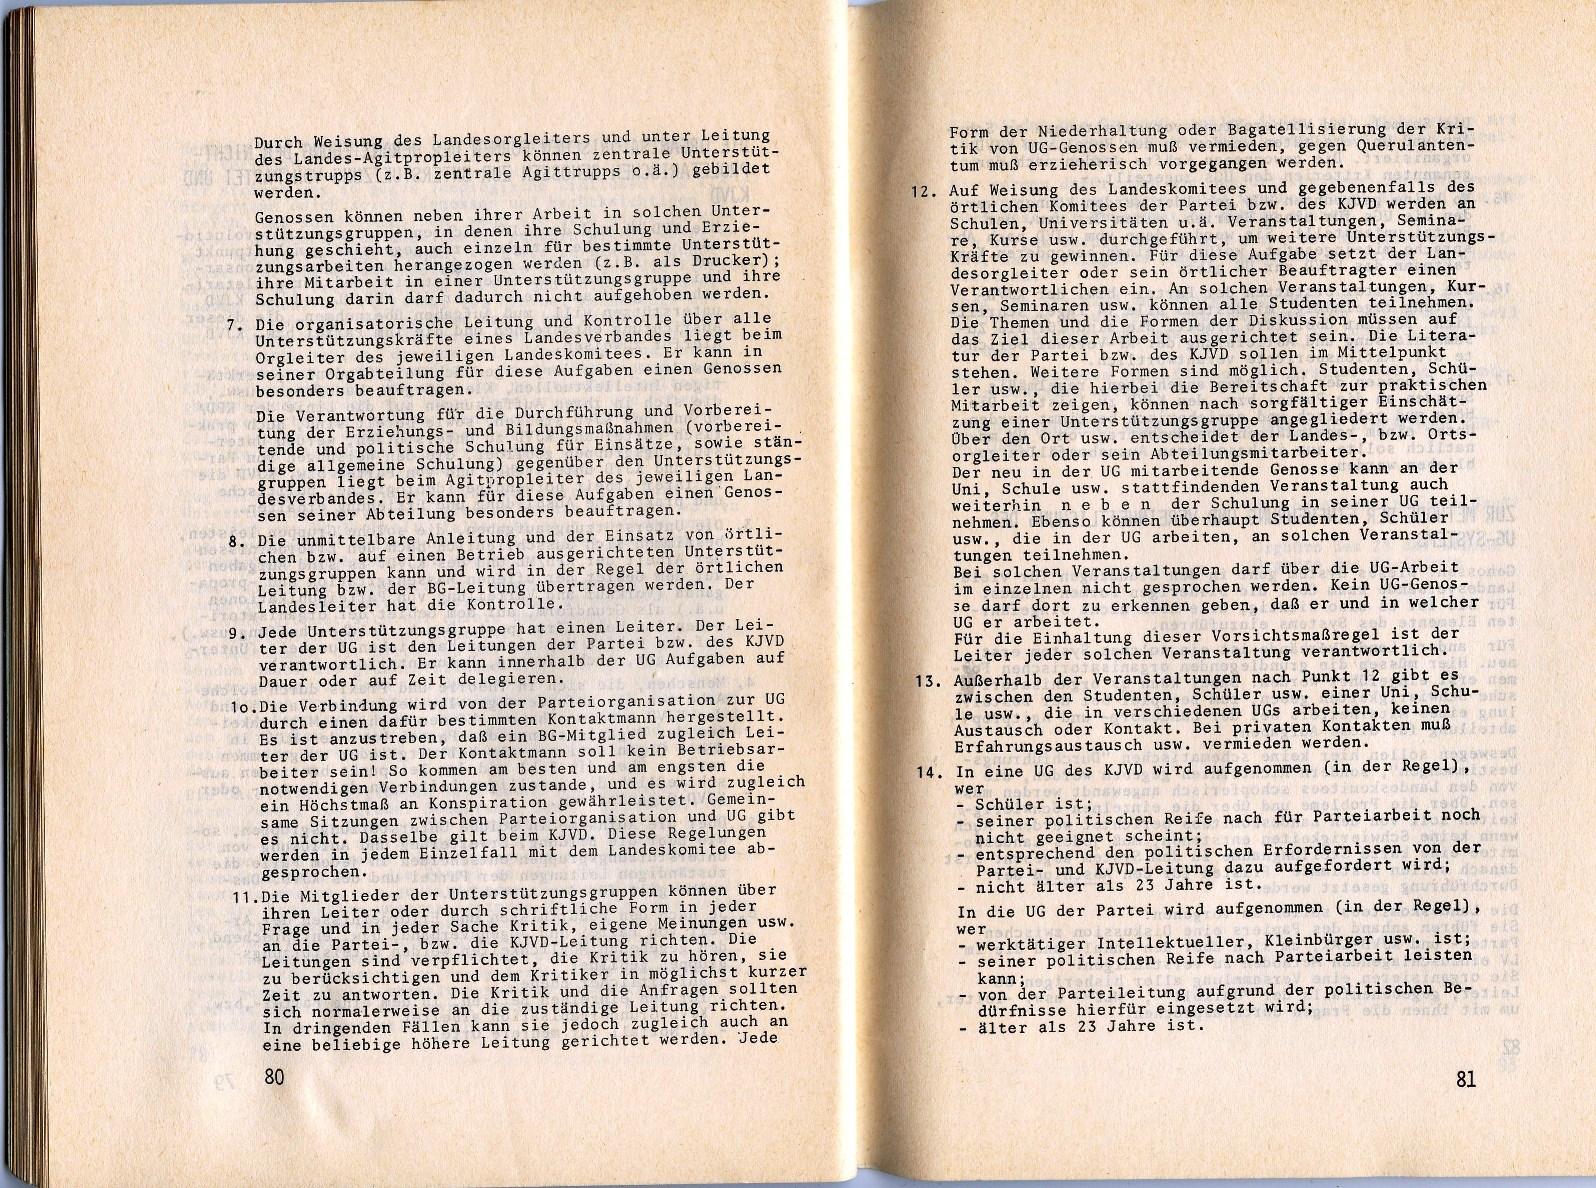 ZB_Parteiarbeiter_1971_07_42